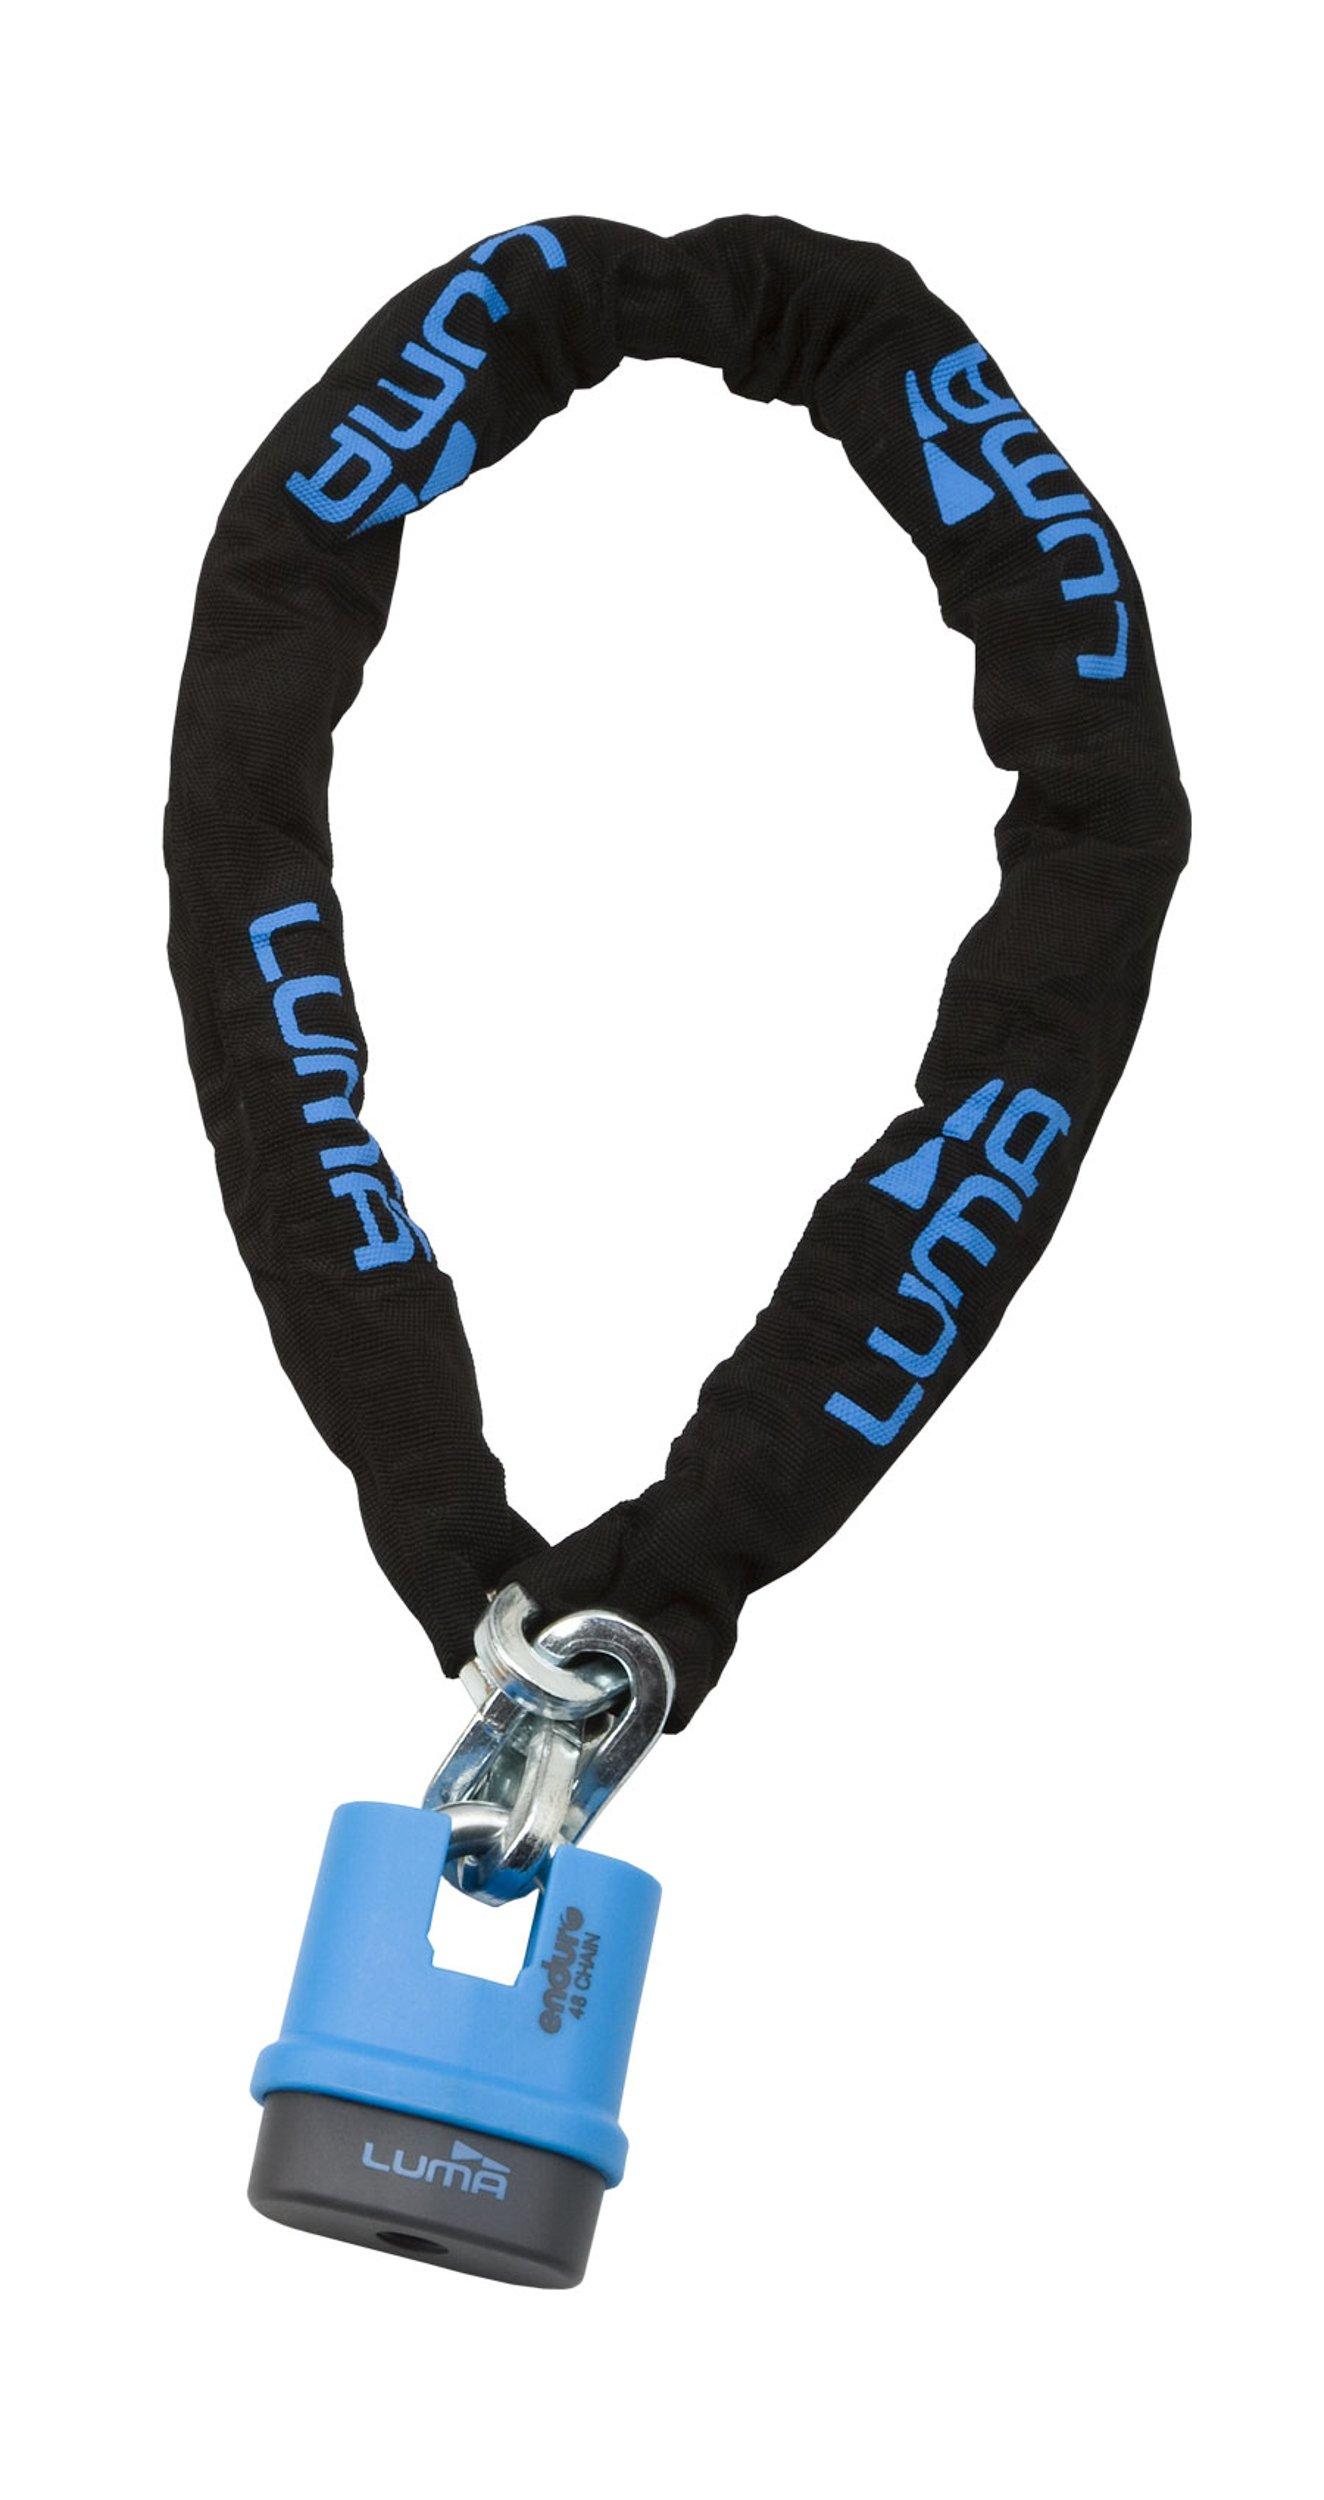 LUMA - KDM4812B/93 : Candado antirrobo Cadena Enduro 48 Chain 10mm product image